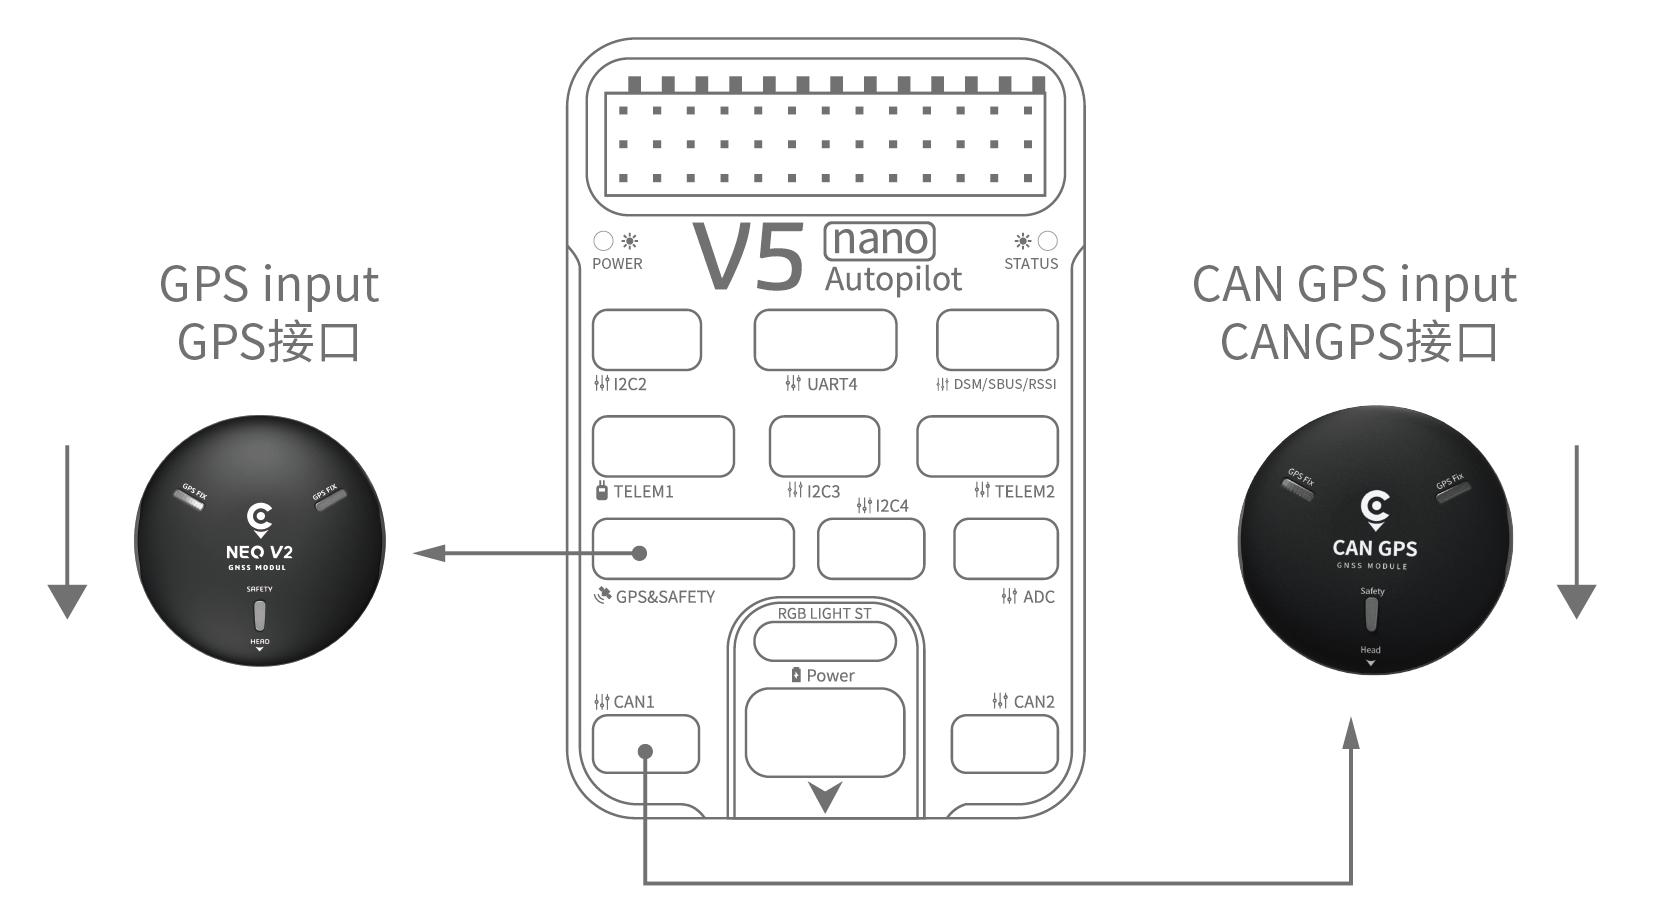 Cuav V5 Nano Wiring Quickstart Px4 V1 9 0 User Guide